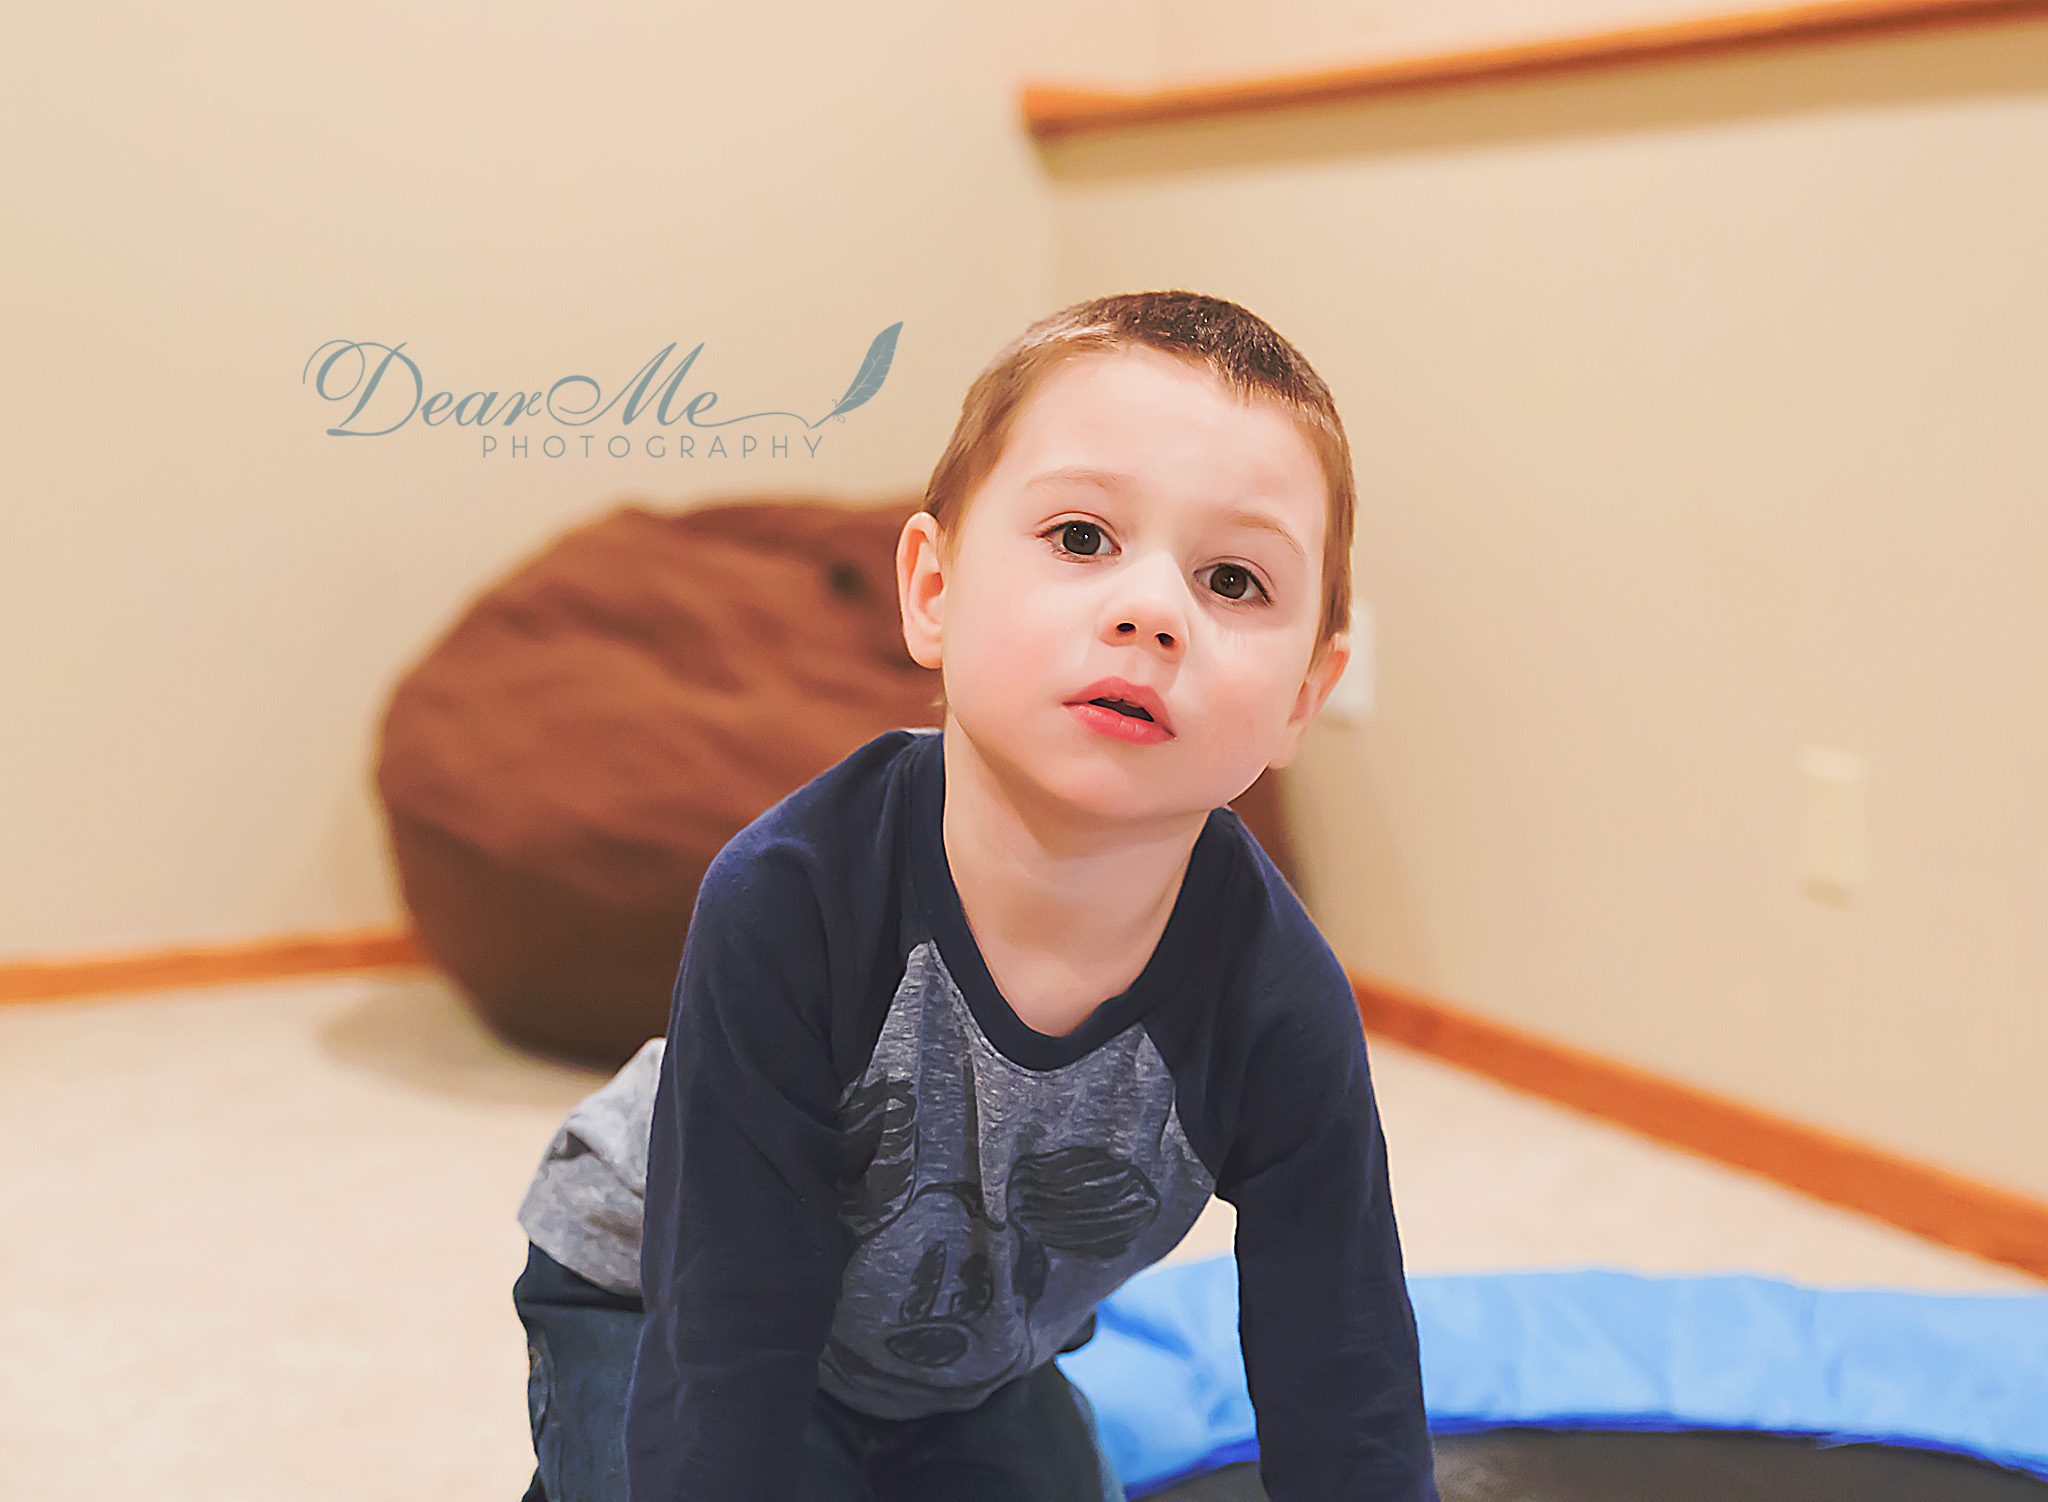 dear me photography bismarck photographer boy kneeling on indoor small trampoline